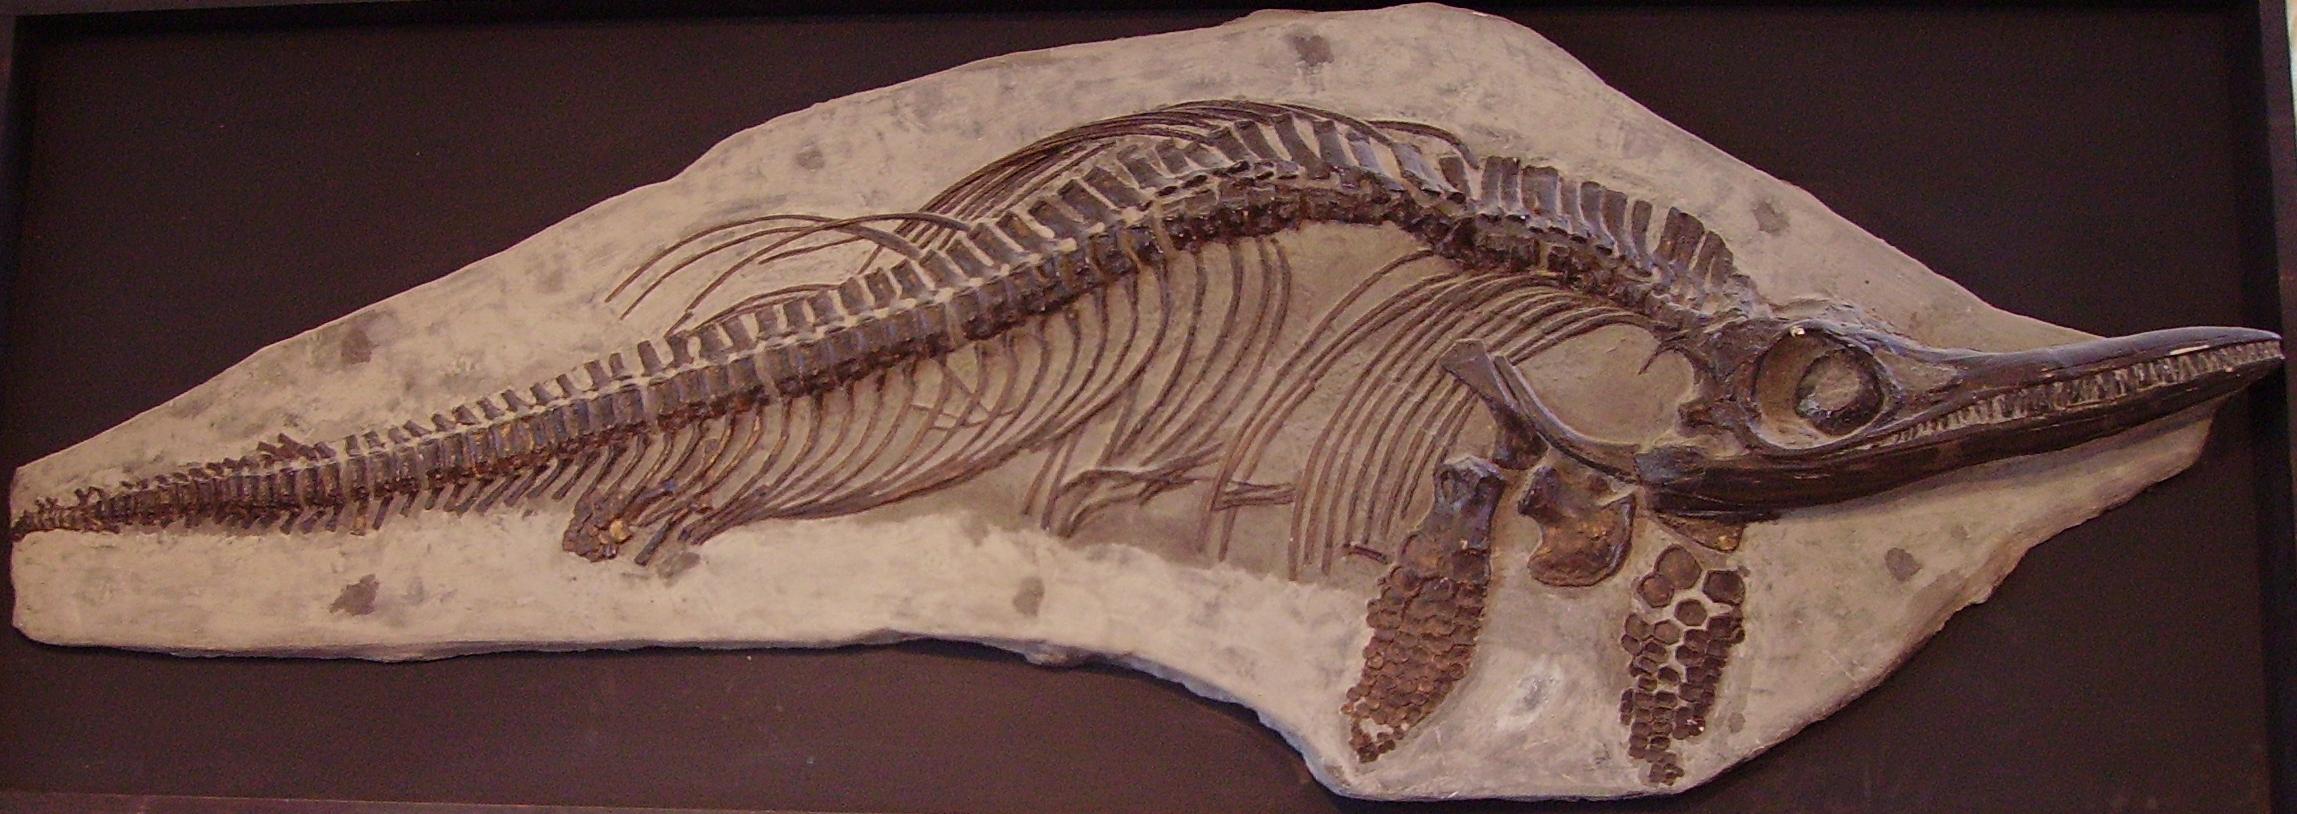 Ichthyosaur sp 22